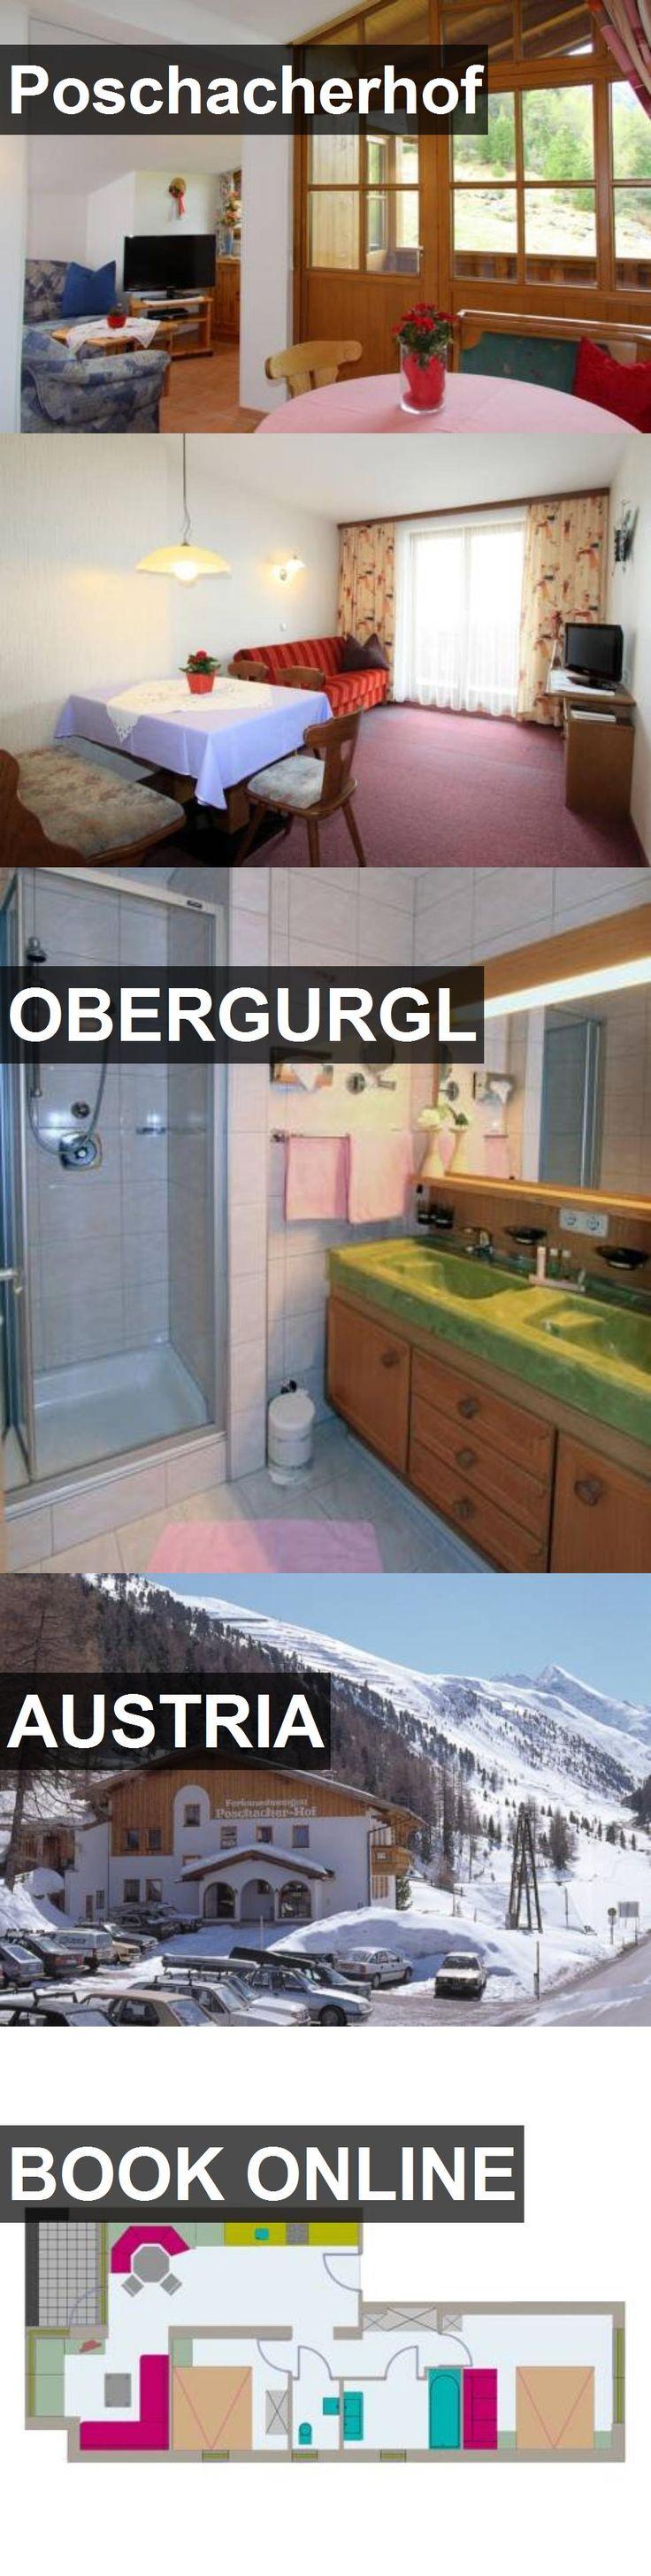 Hotel Poschacherhof in Obergurgl, Austria. For more information, photos, reviews and best prices please follow the link. #Austria #Obergurgl #Poschacherhof #hotel #travel #vacation